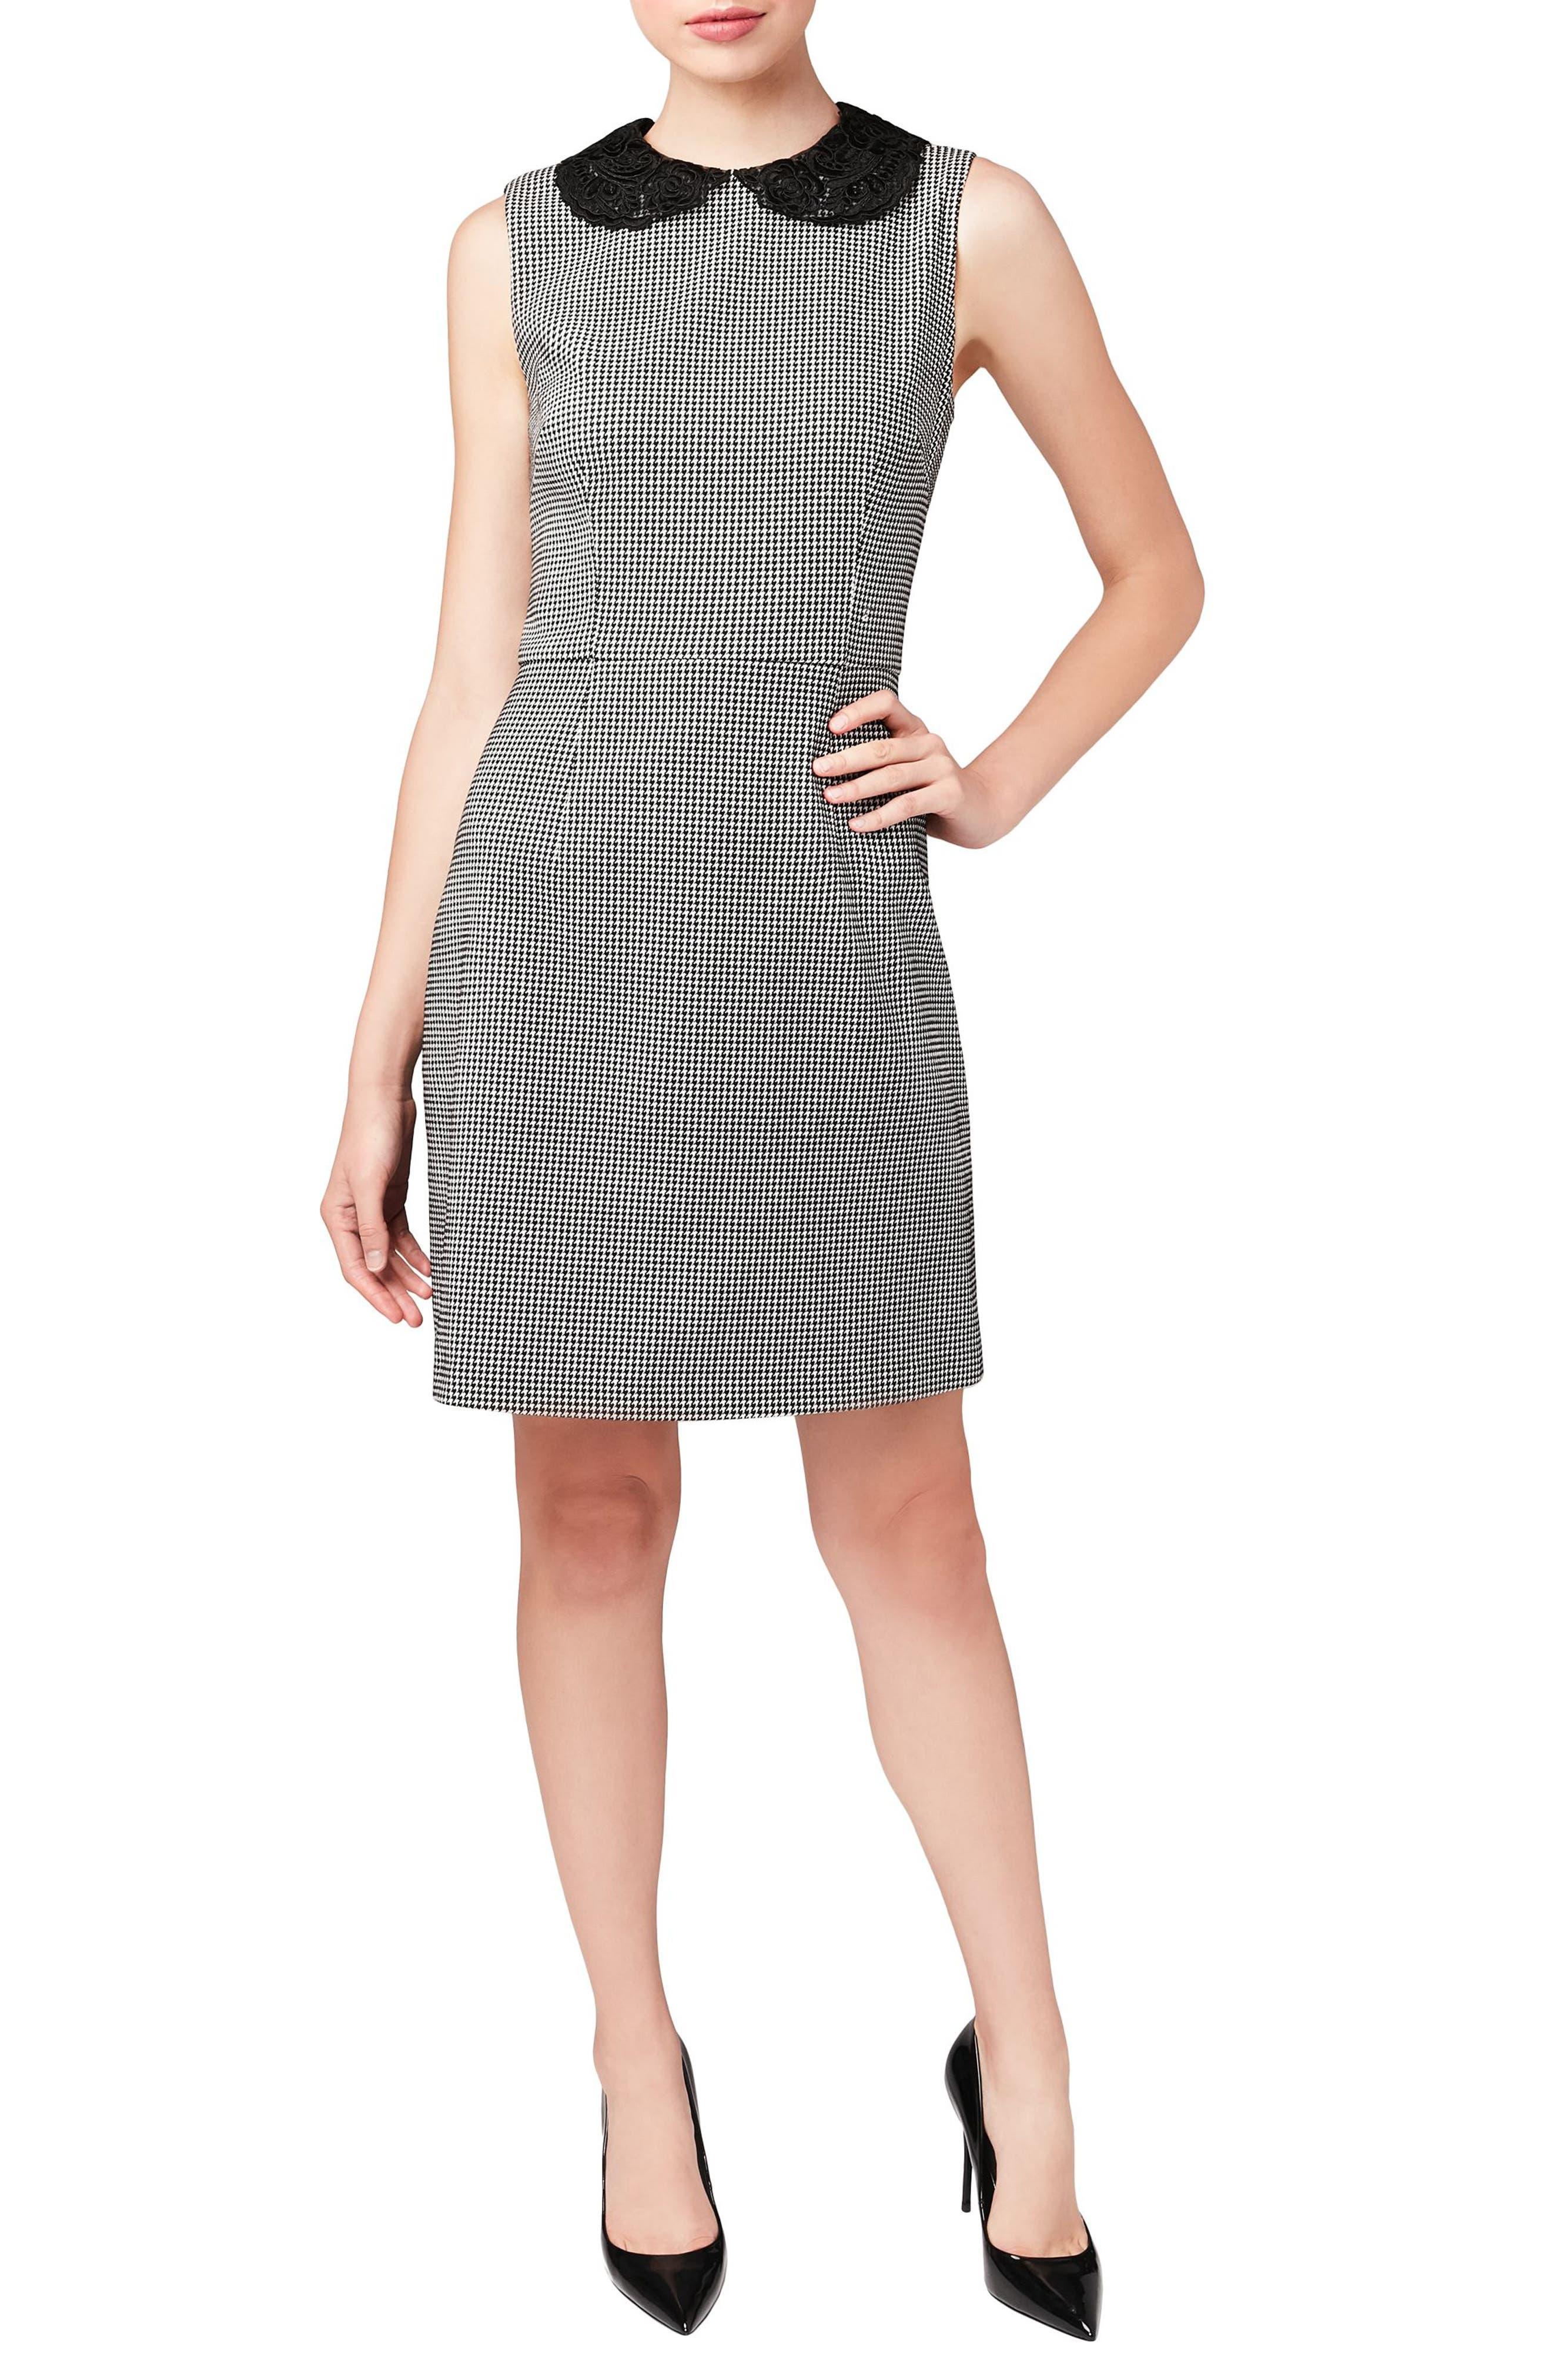 Lace Collar Shift Dress,                         Main,                         color, Black/ White